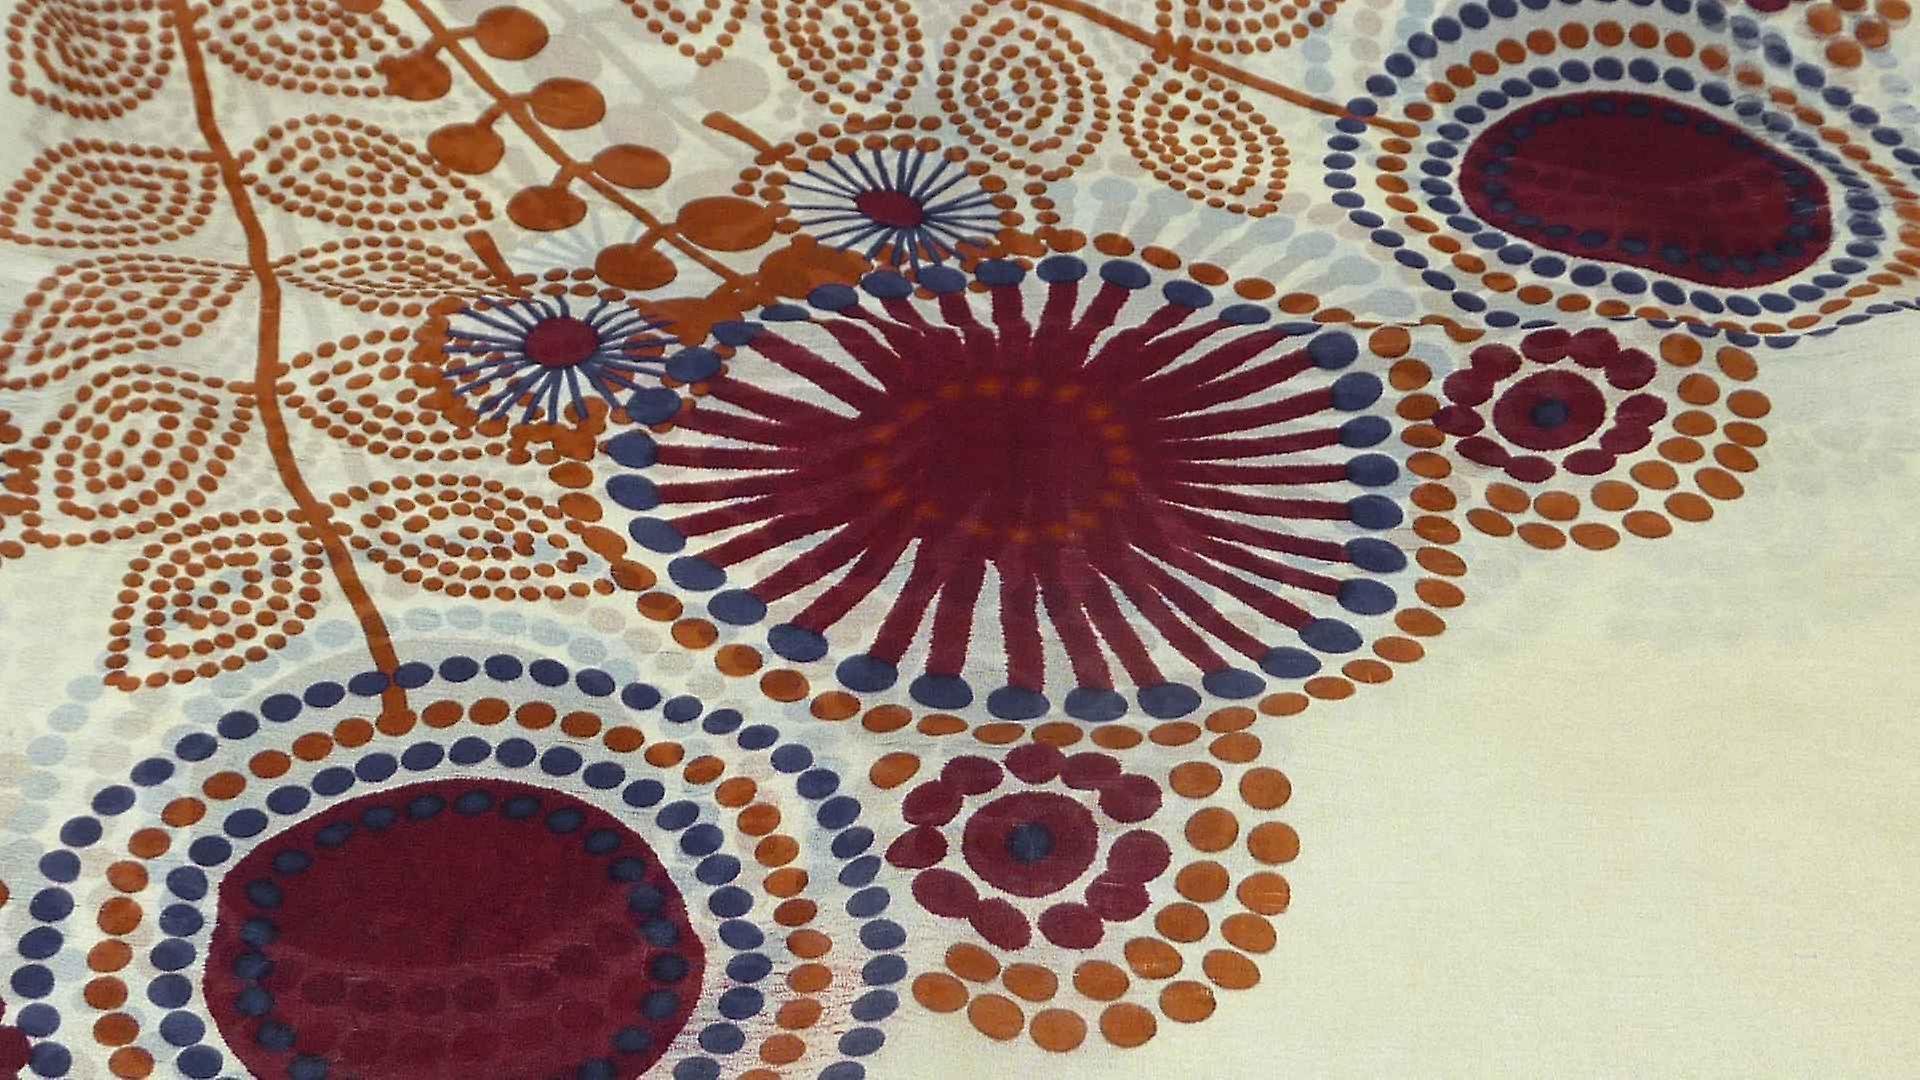 Mulberry Silk Contemporary Square Scarf Geometric G125 by Pashmina & Silk